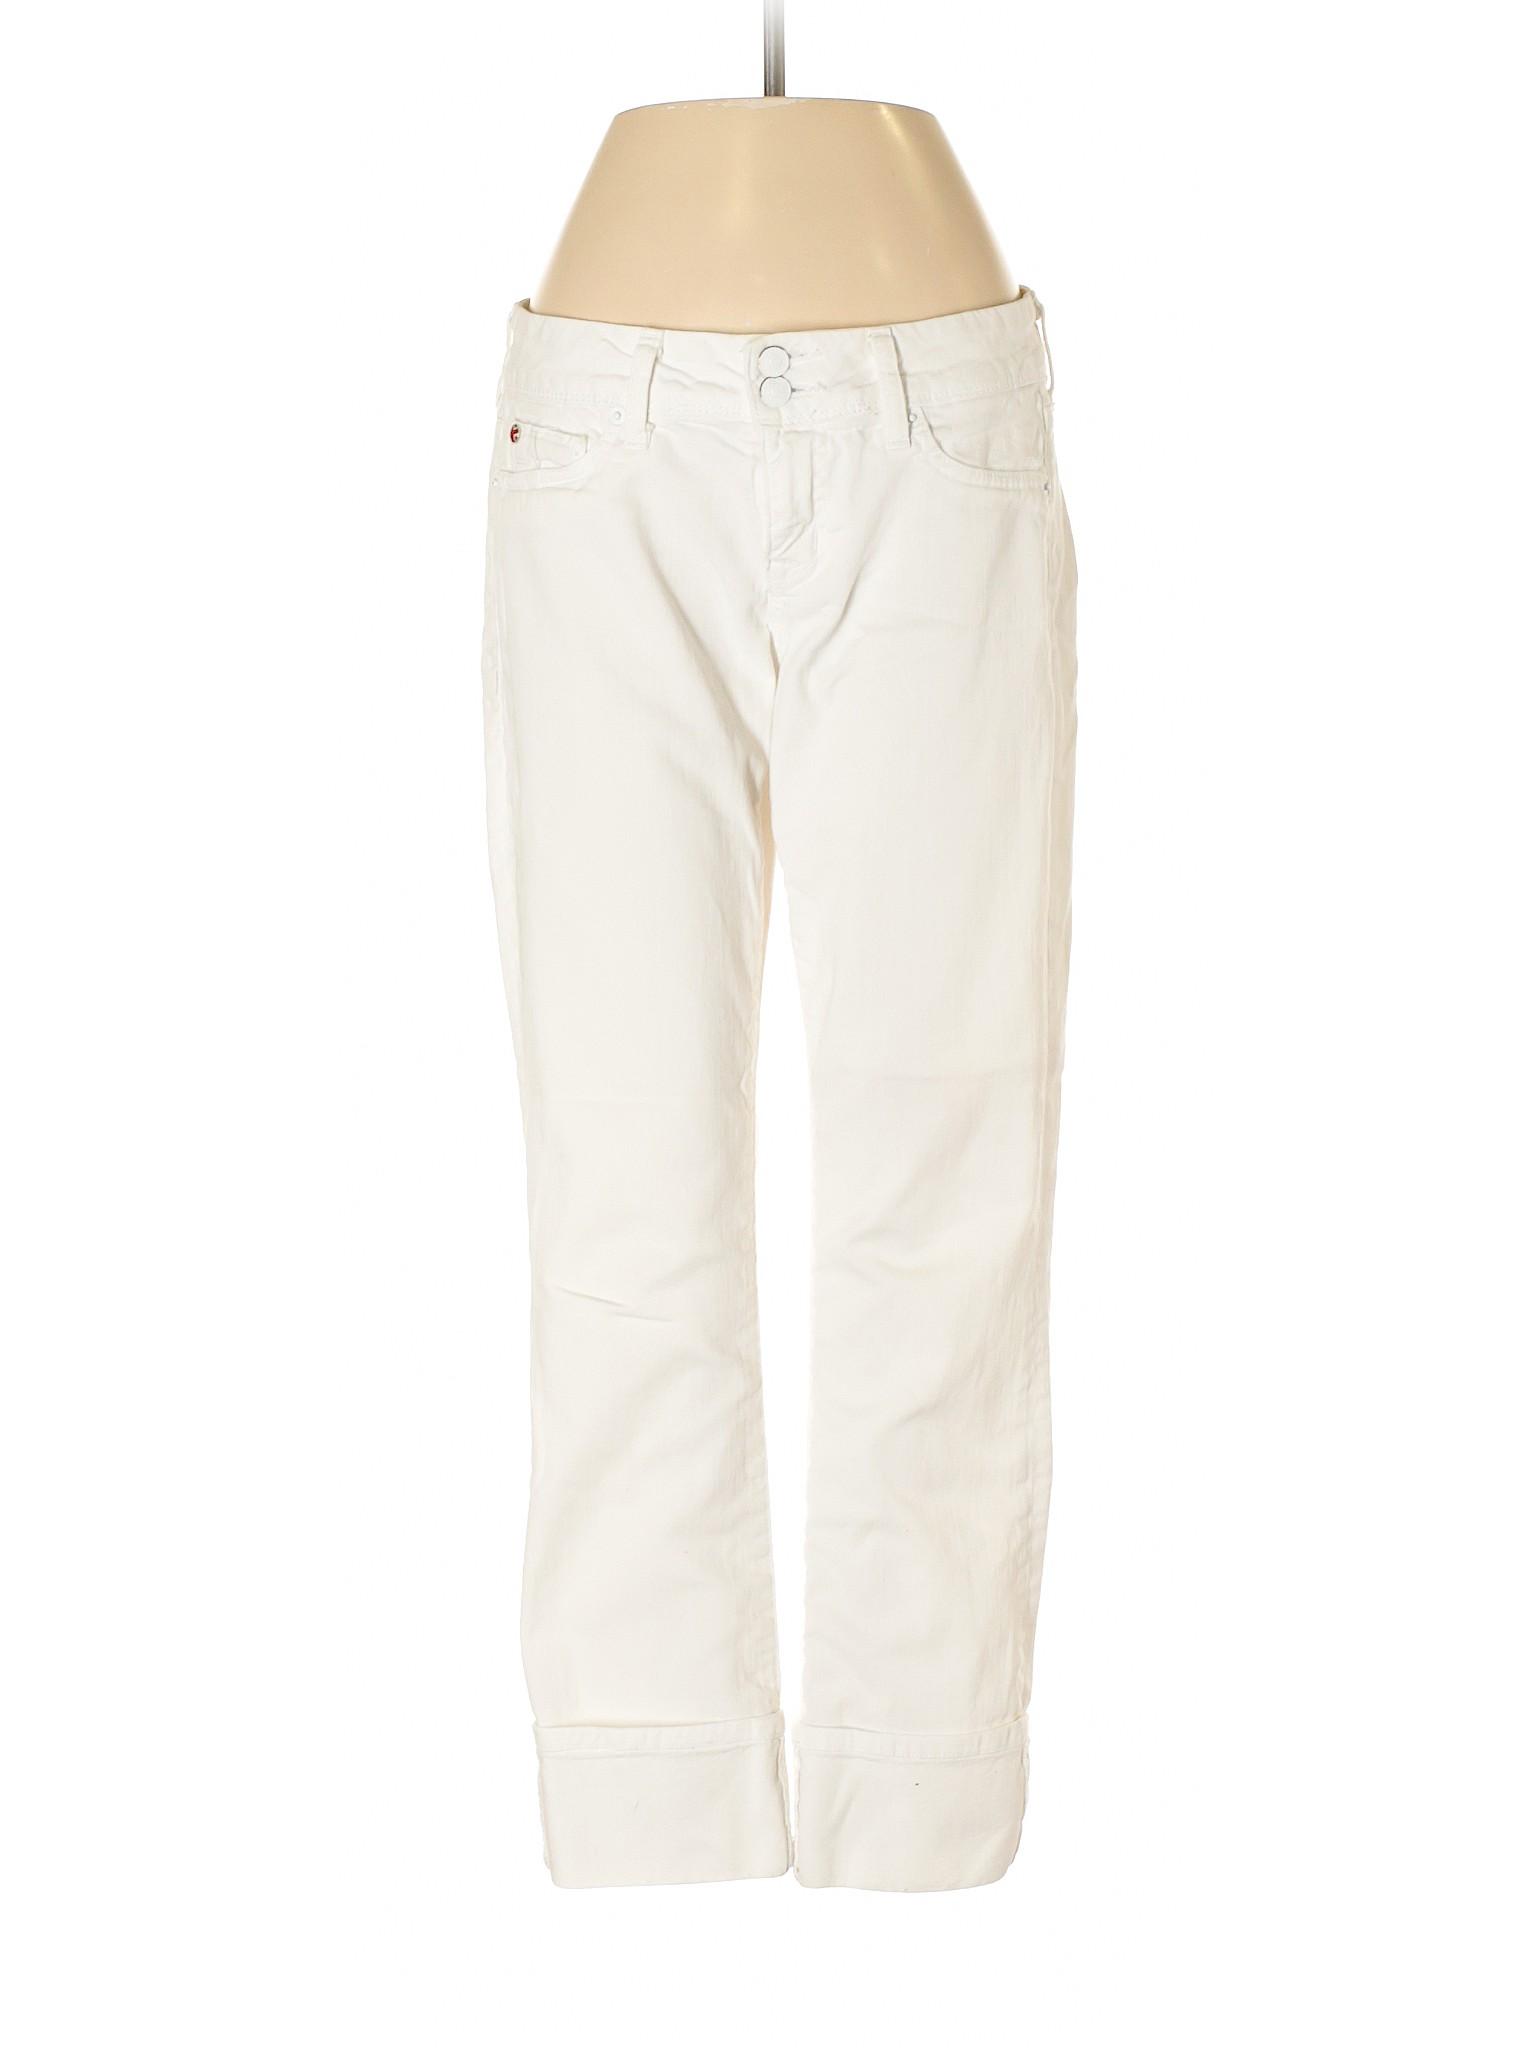 Promotion Hudson Hudson Promotion Jeans 11Oqv0w